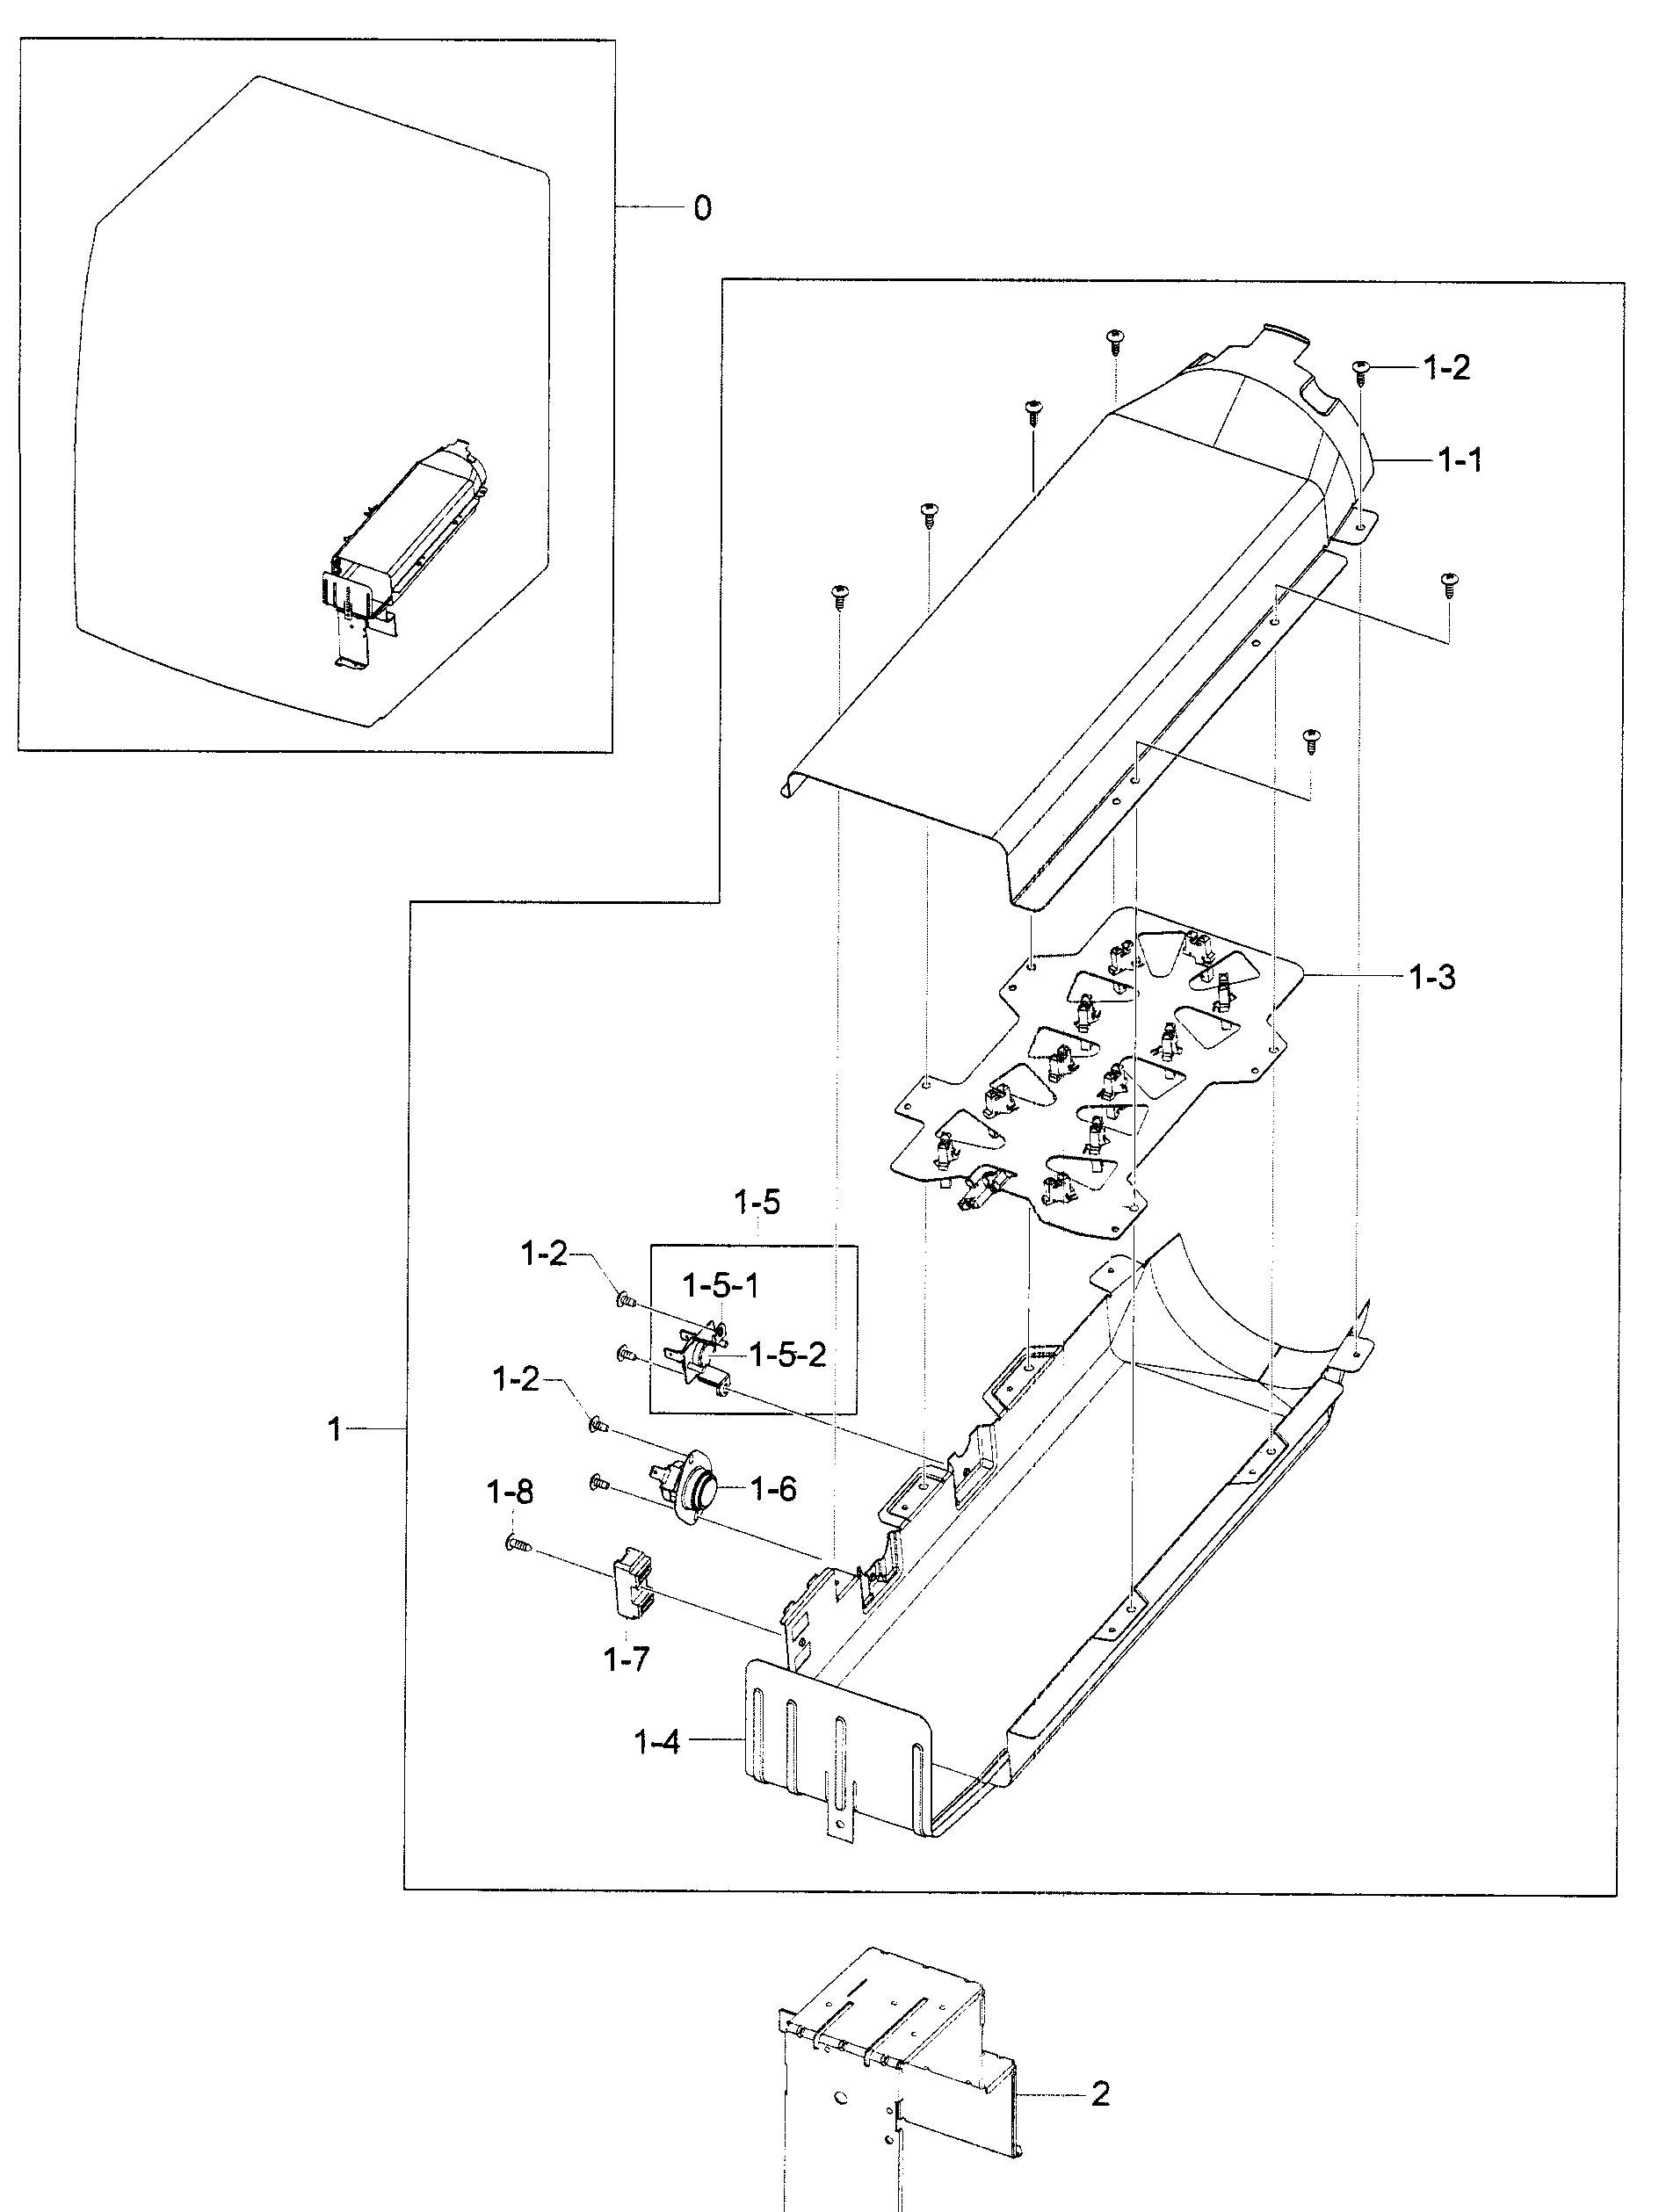 Samsung Dv210aew Xaa Wiring Diagram